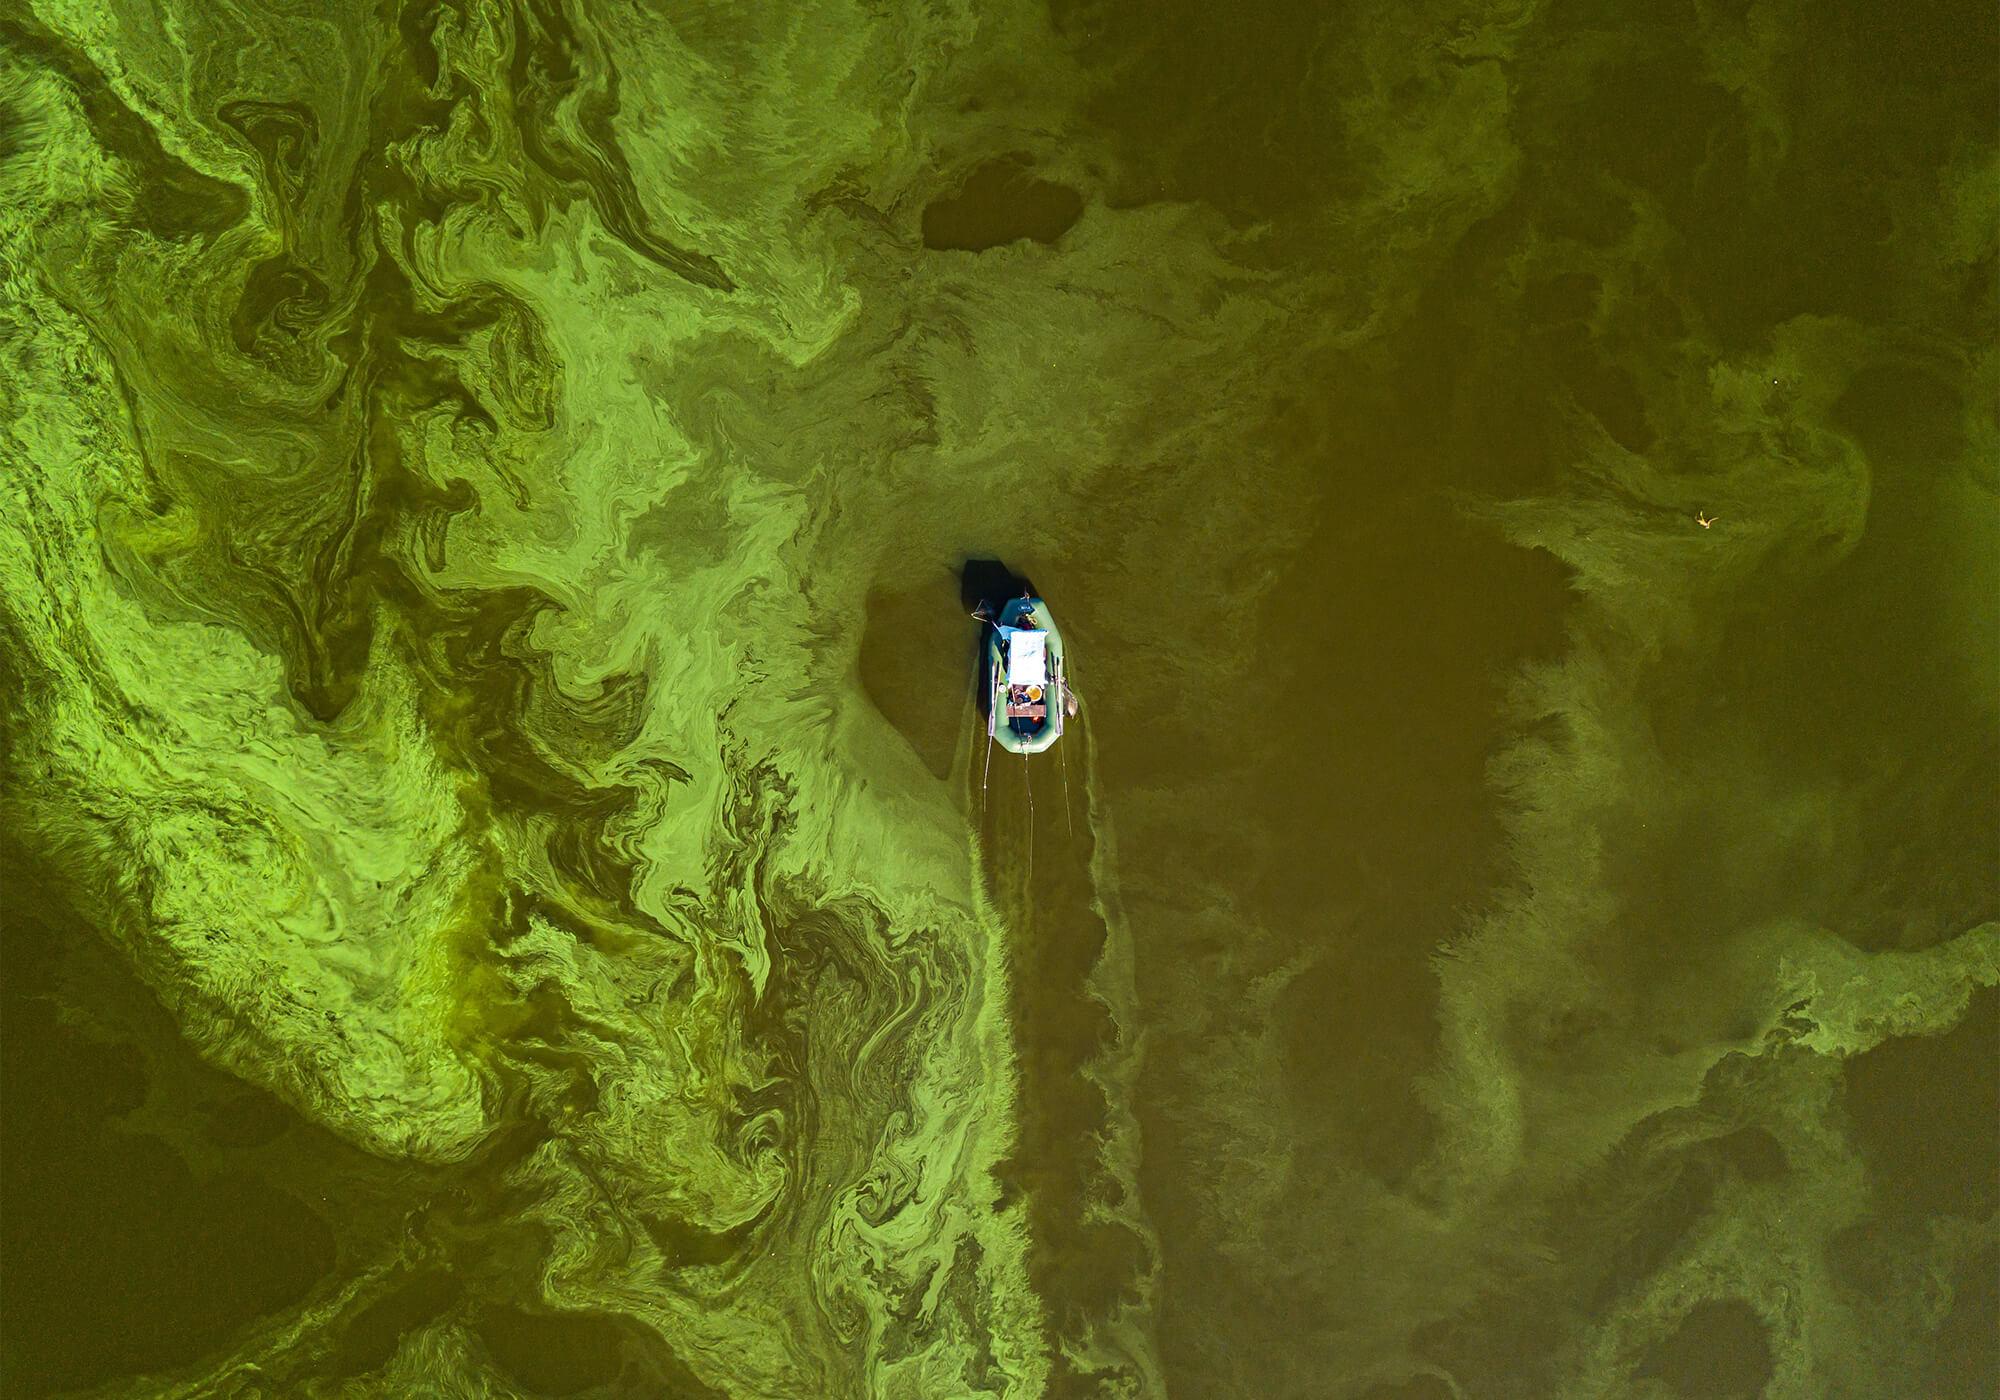 Algae Bloom Environmental Pollution